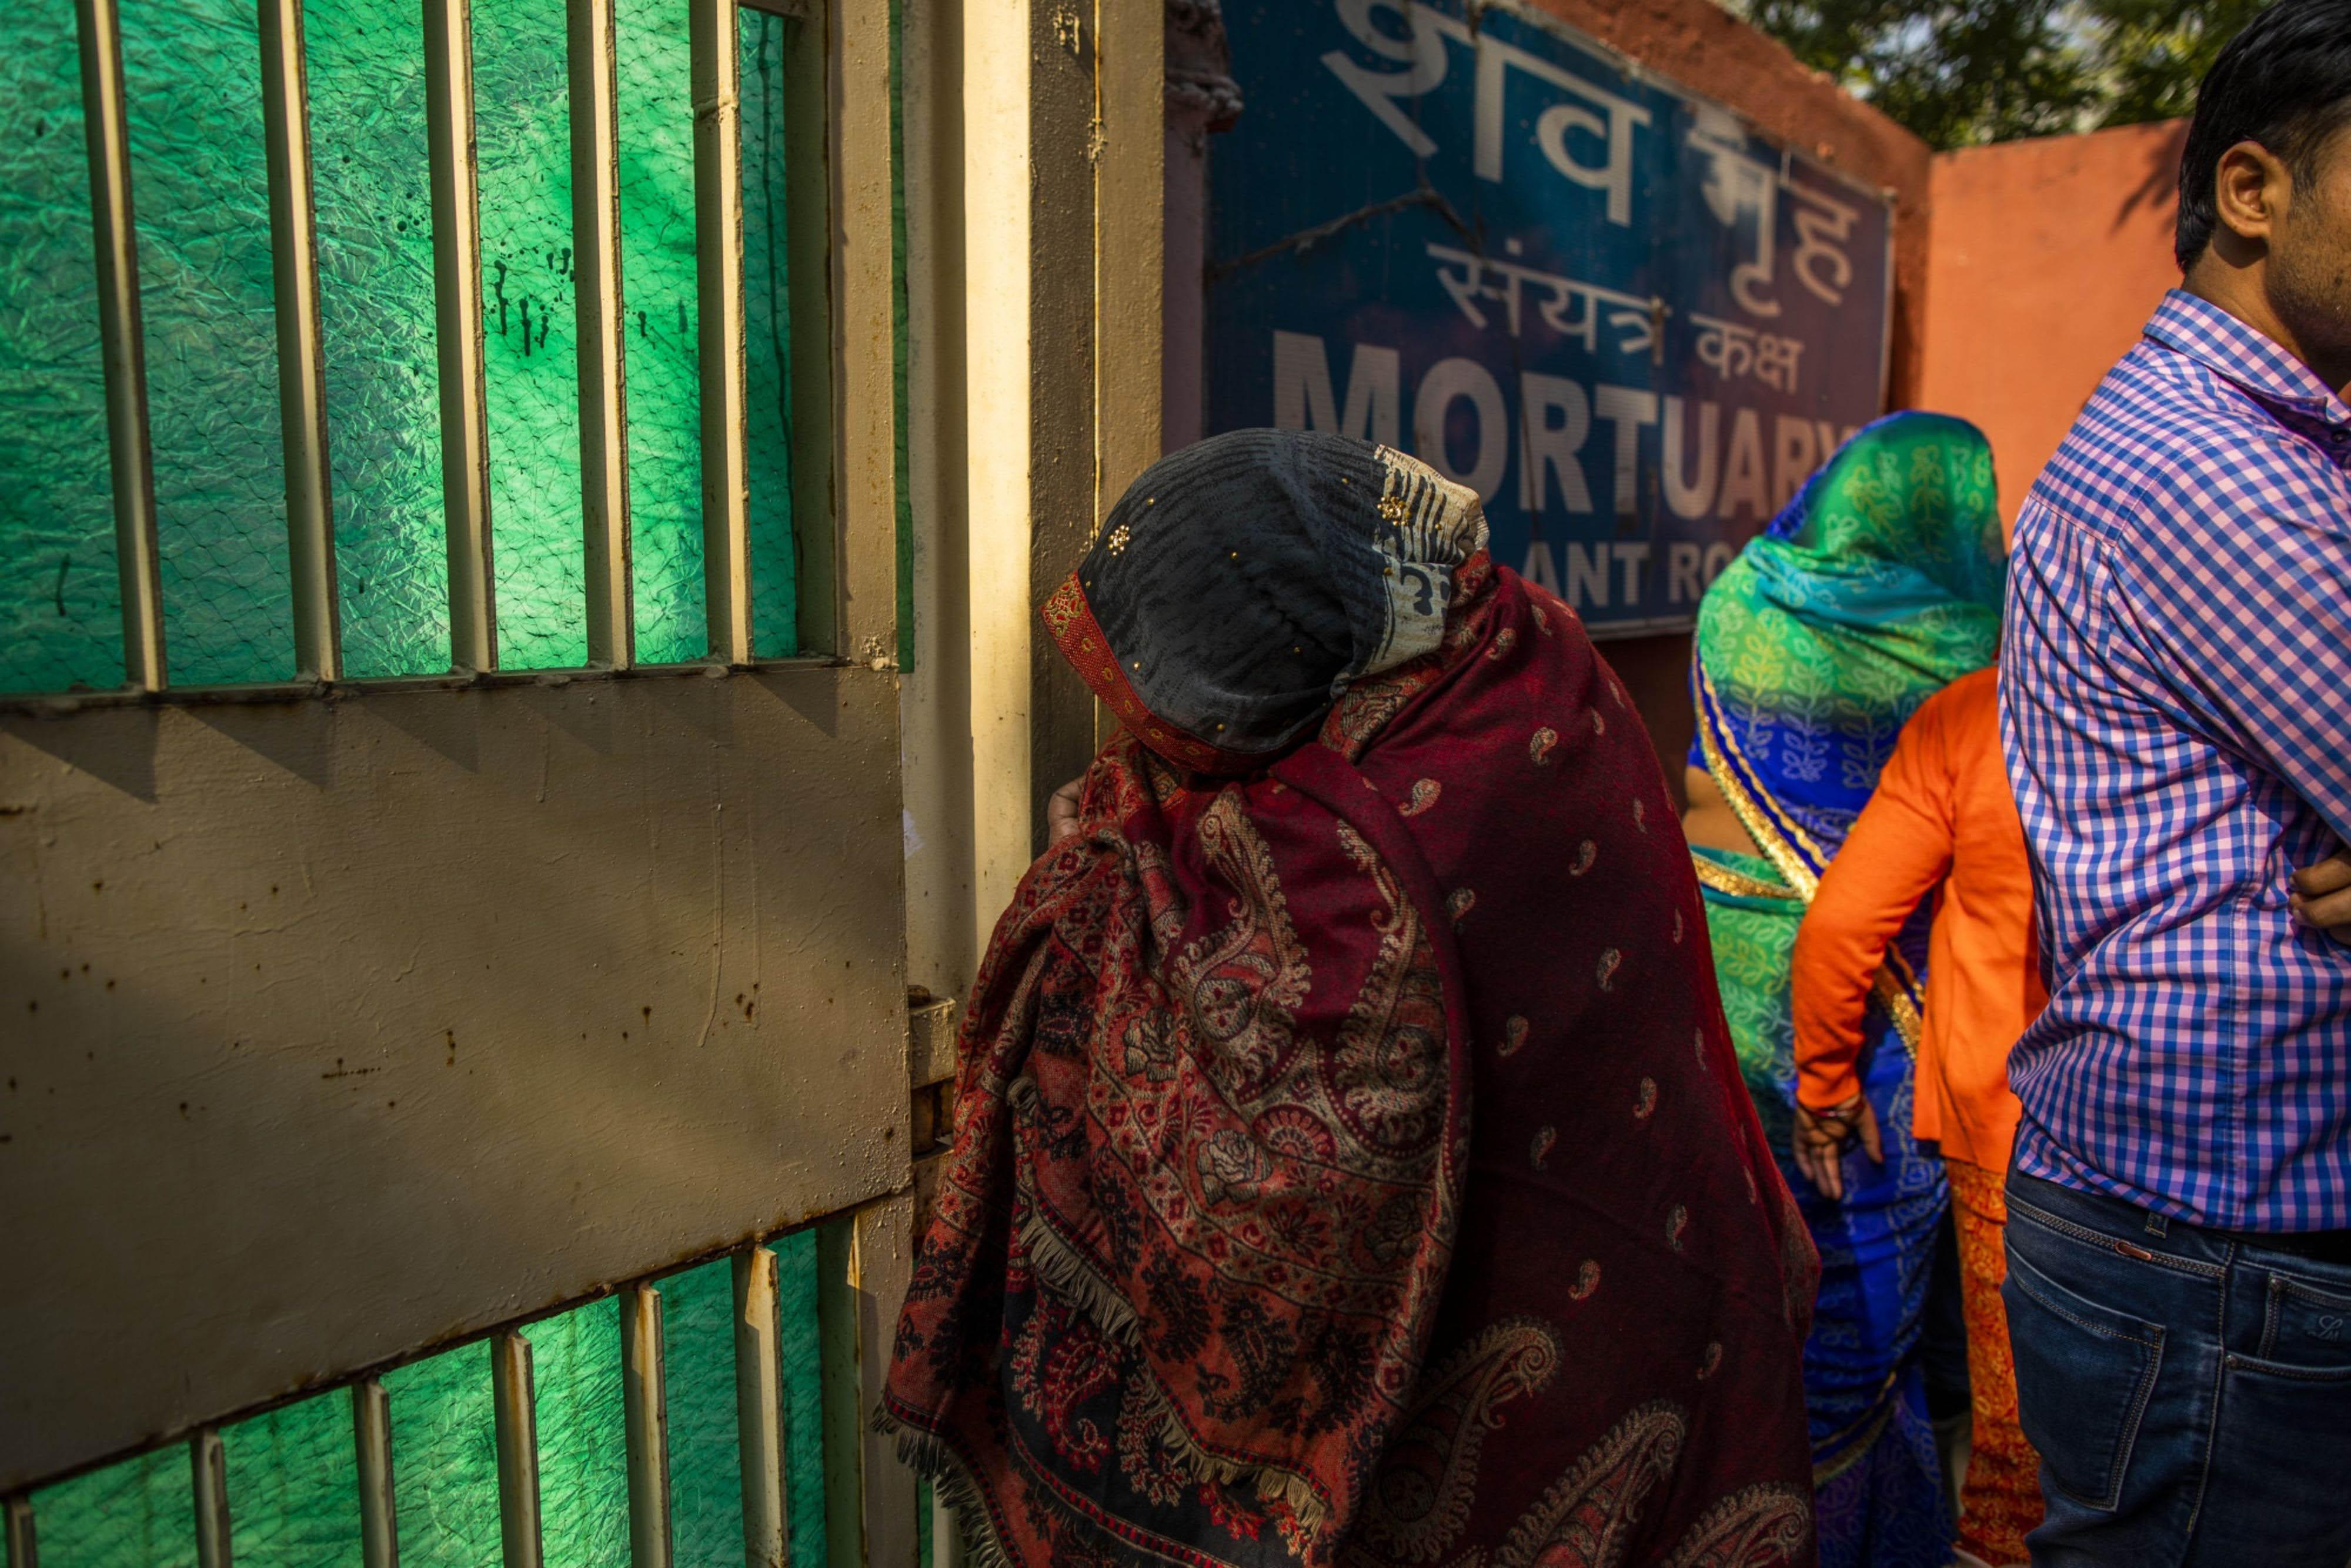 A woman peeks through the gate to the mortuary at the Guru Teg Bahadur Hospital in Delhi, India, on Feb. 26, 2020. MUST CREDIT: Bloomberg photo by Prashanth Vishwanathan.